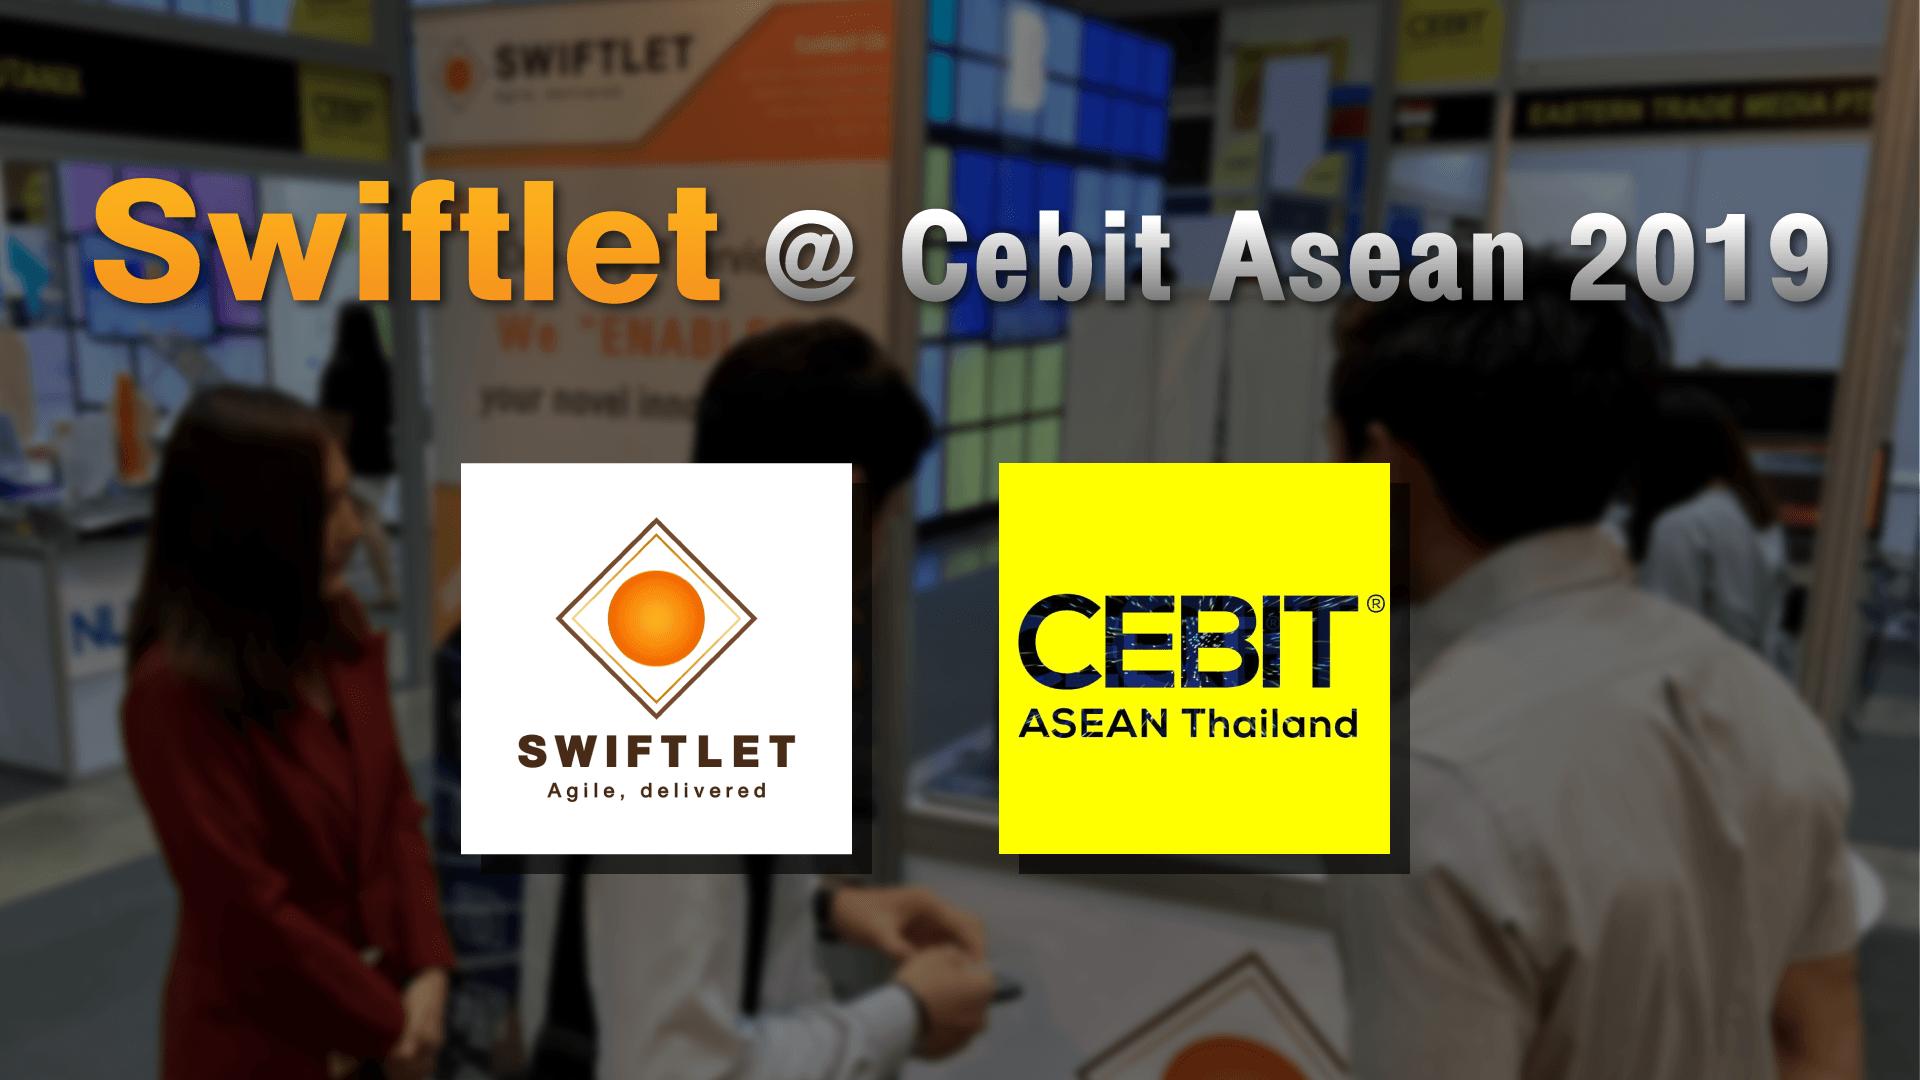 CEBIT ASEAN 2019